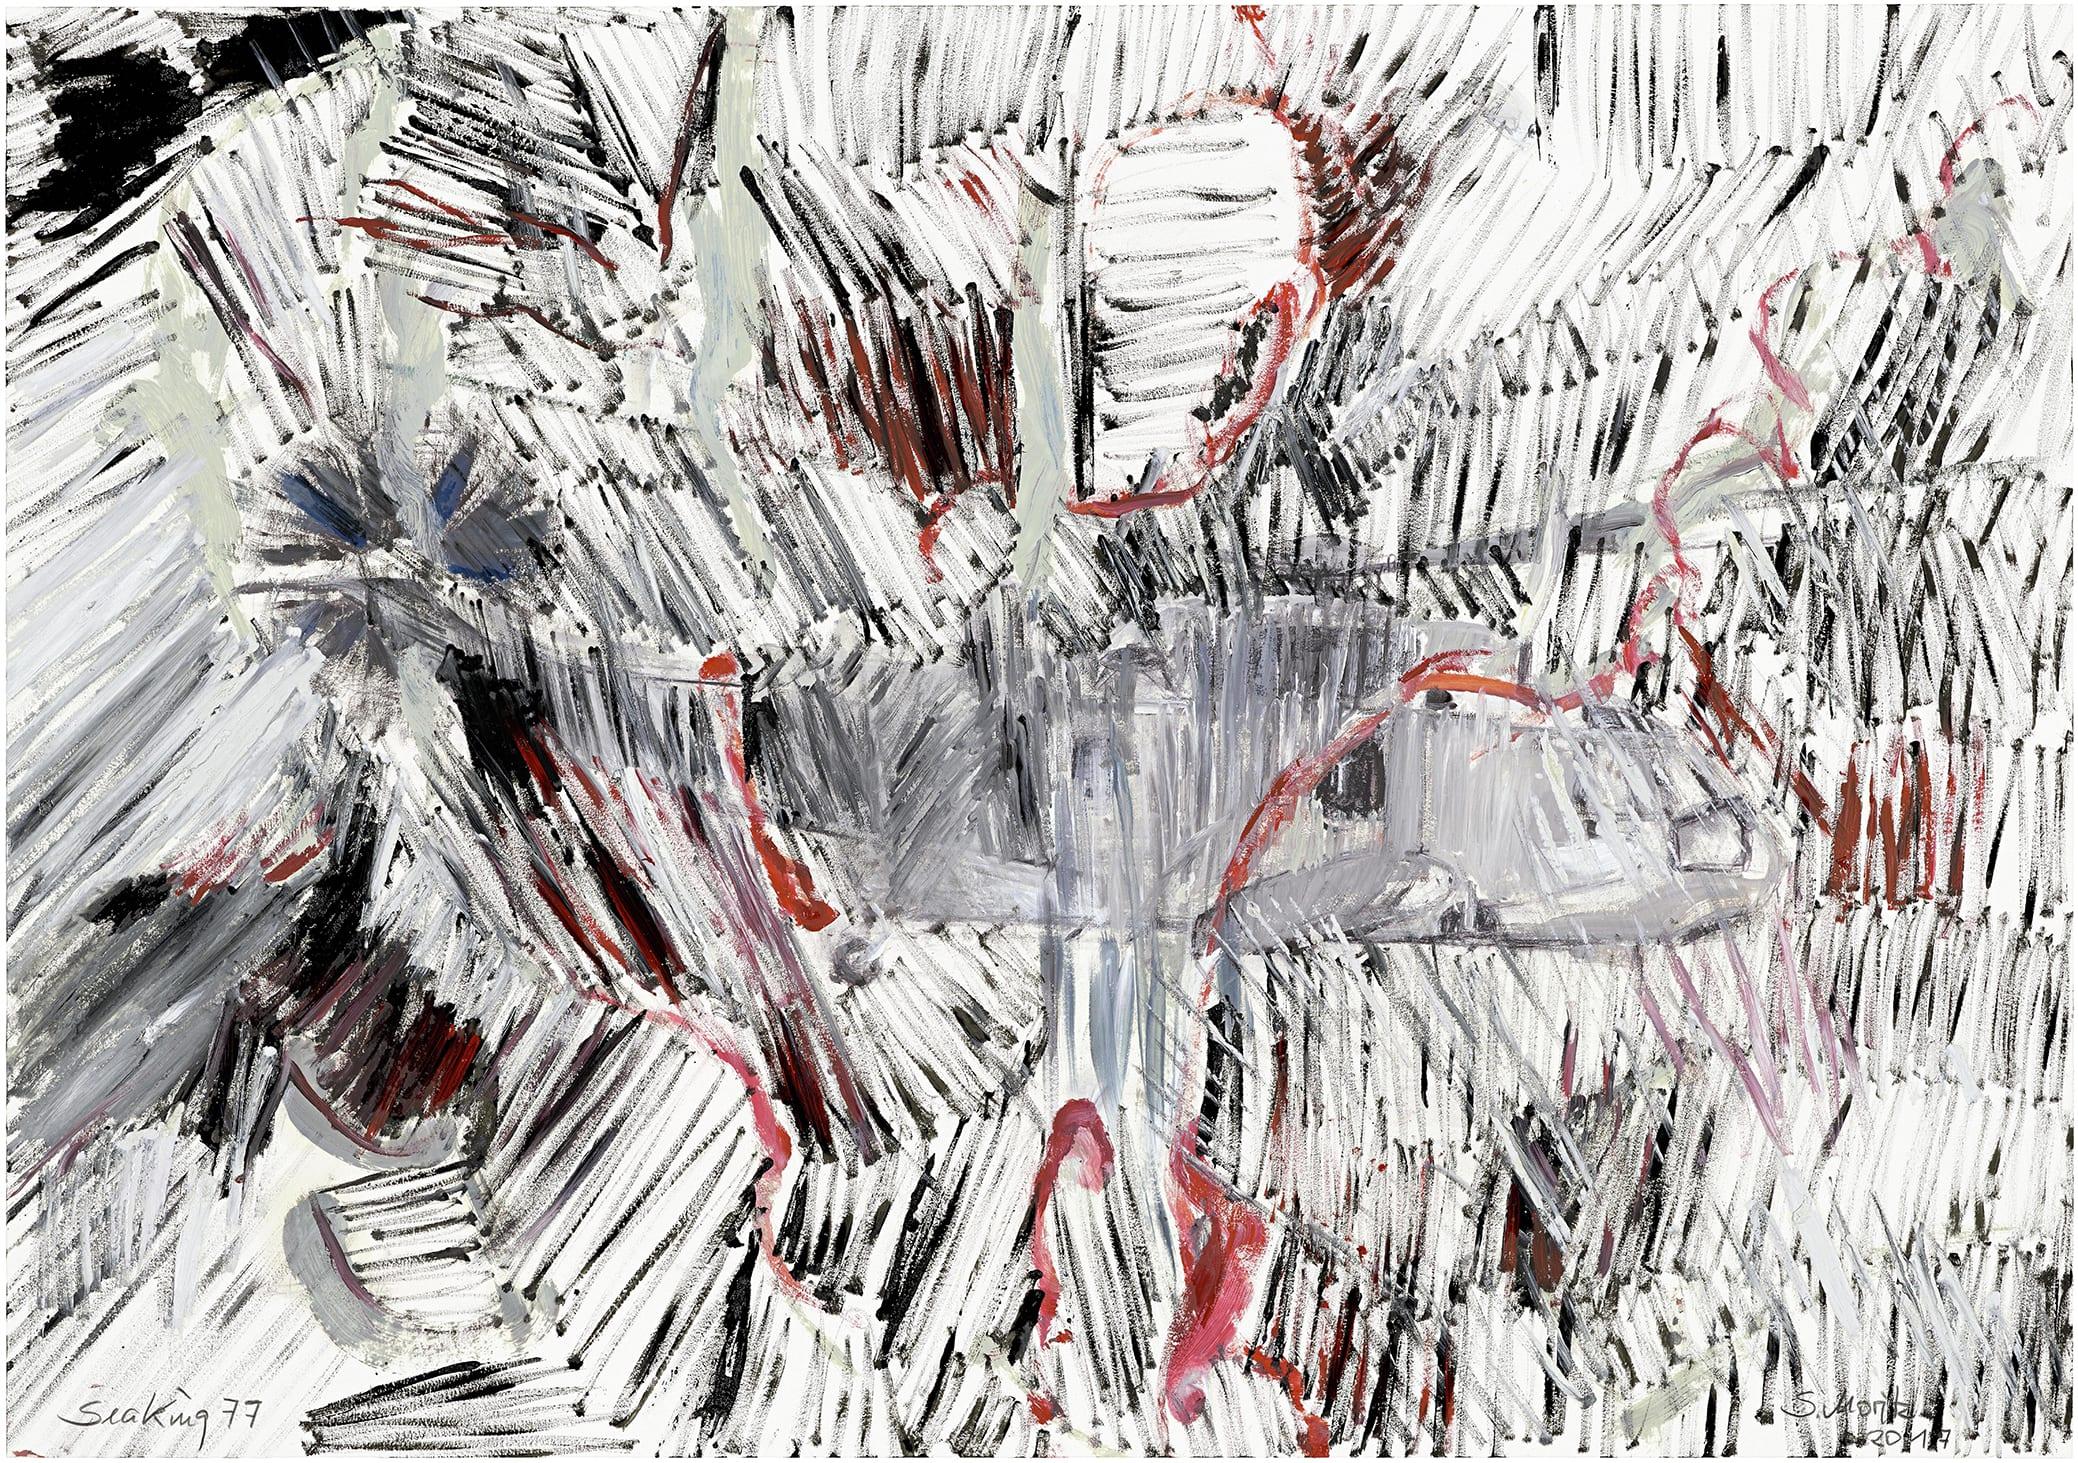 Sabine Moritz, Sea King 77, 2017